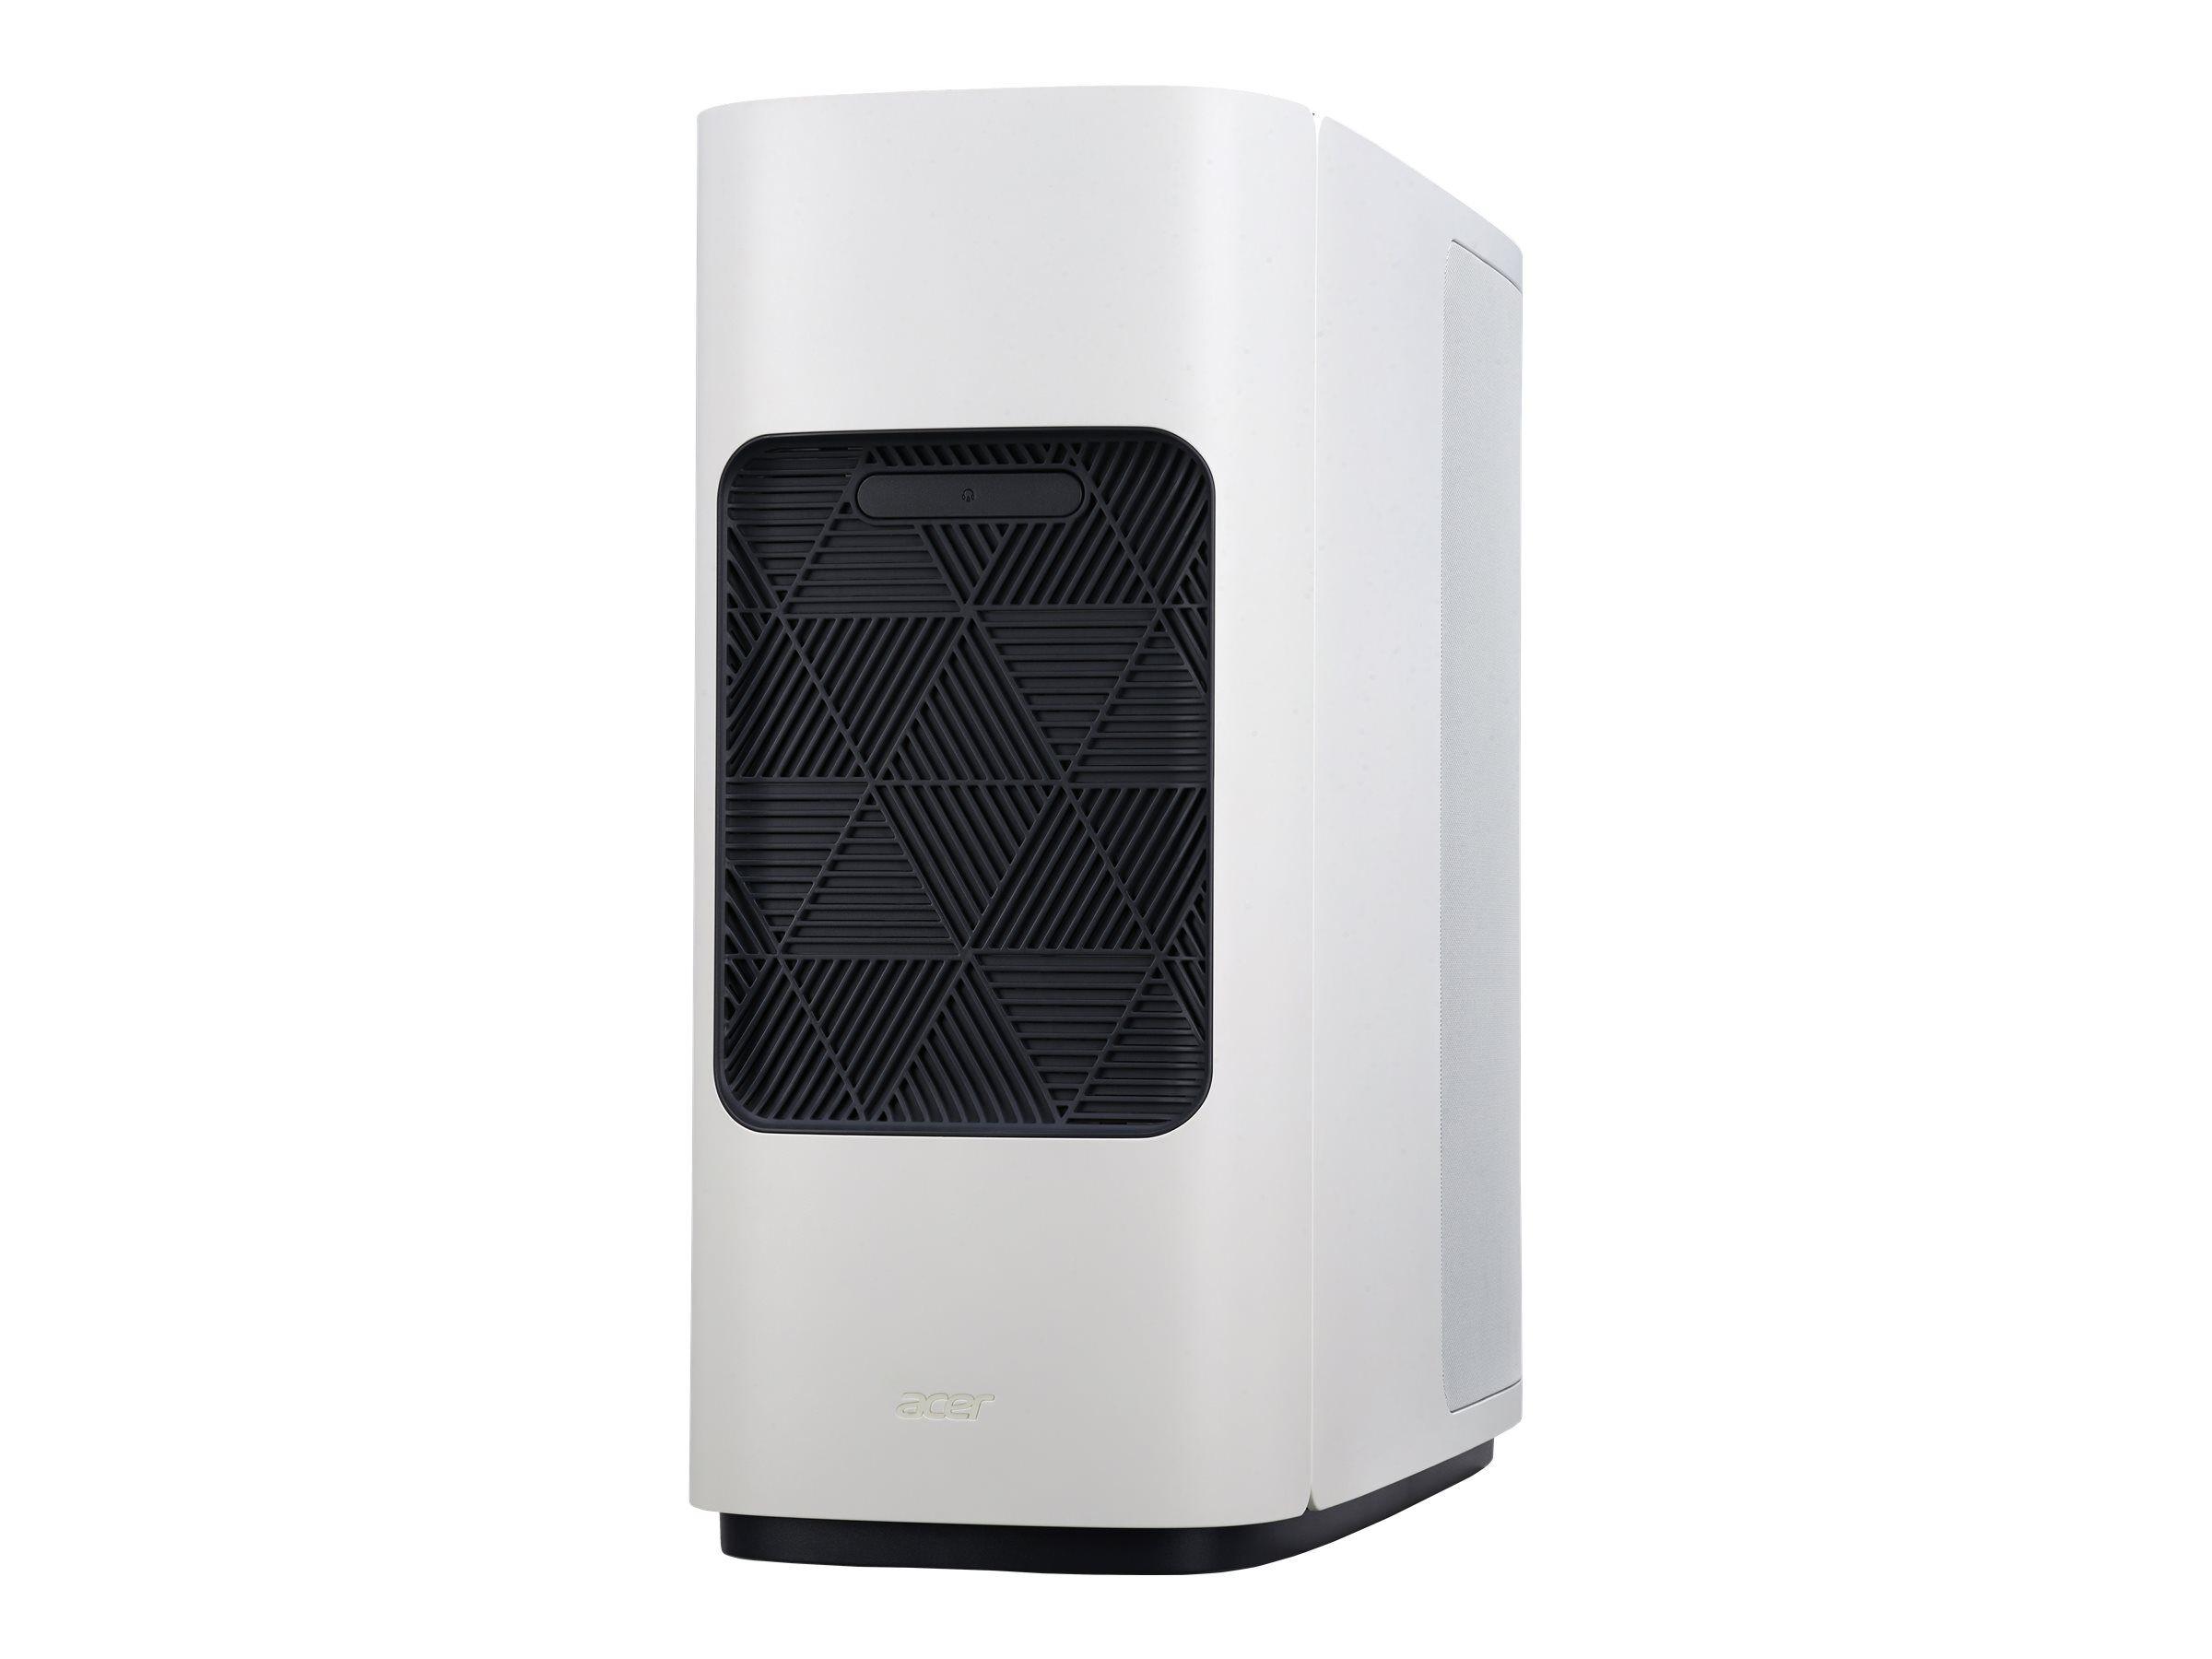 Acer ConceptD 500 CT500-51A - MDT - Core i9 9900K / 3.6 GHz - RAM 32 Go - SSD 512 Go, HDD 1 To - Quadro P2200 - GigE, 802.11ac Wave 2 - LAN sans fil: 802.11a/b/g/n/ac Wave 2, Bluetooth 5.0 - Win 10 Pro 64 bits - moniteur : aucun